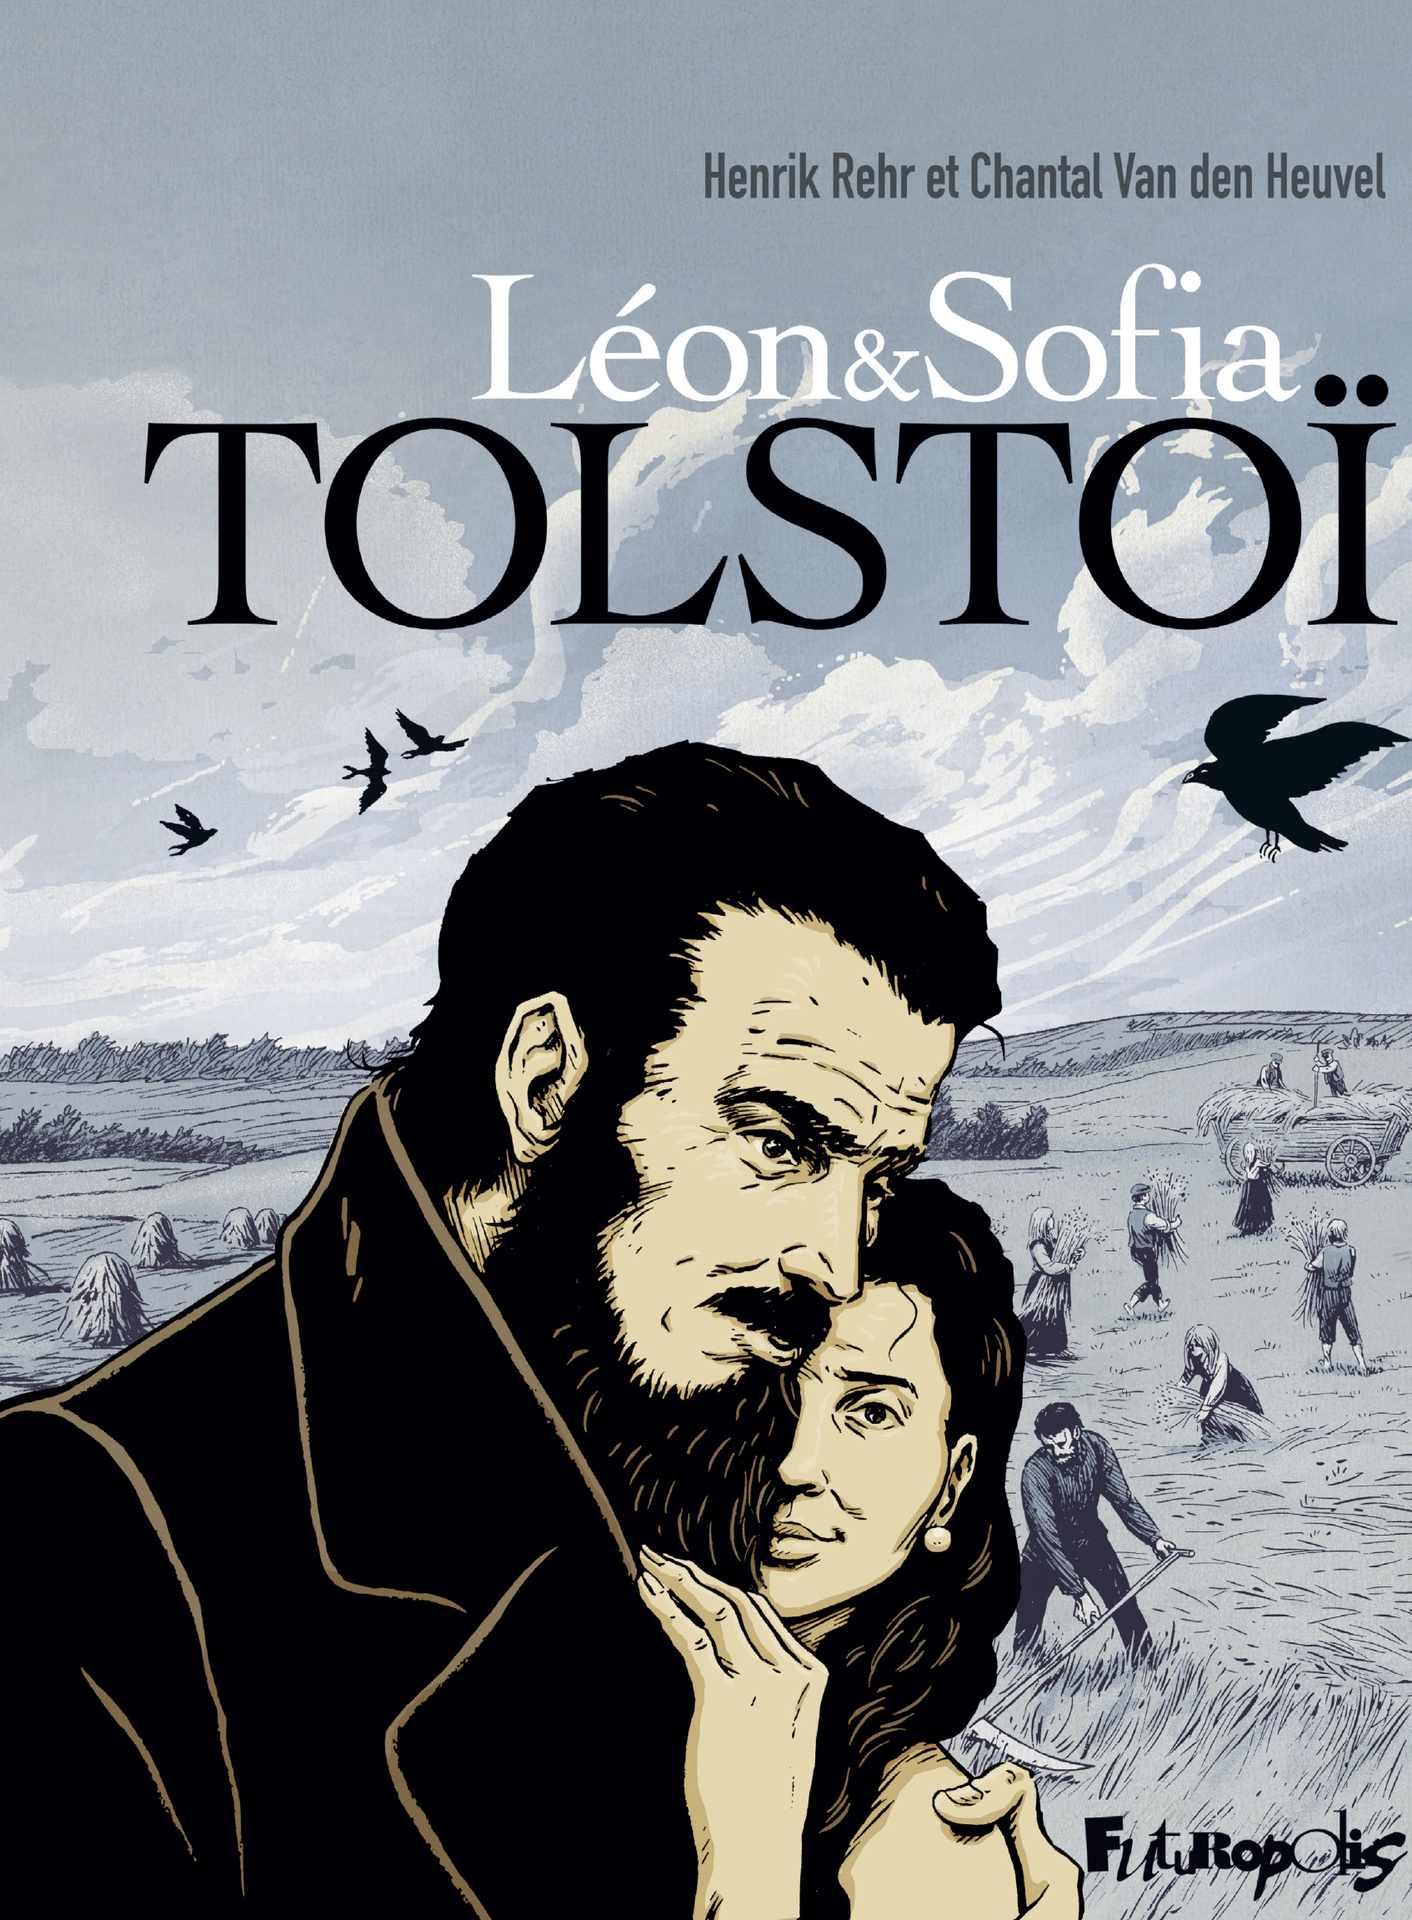 Léon et Sophia Tolstoï